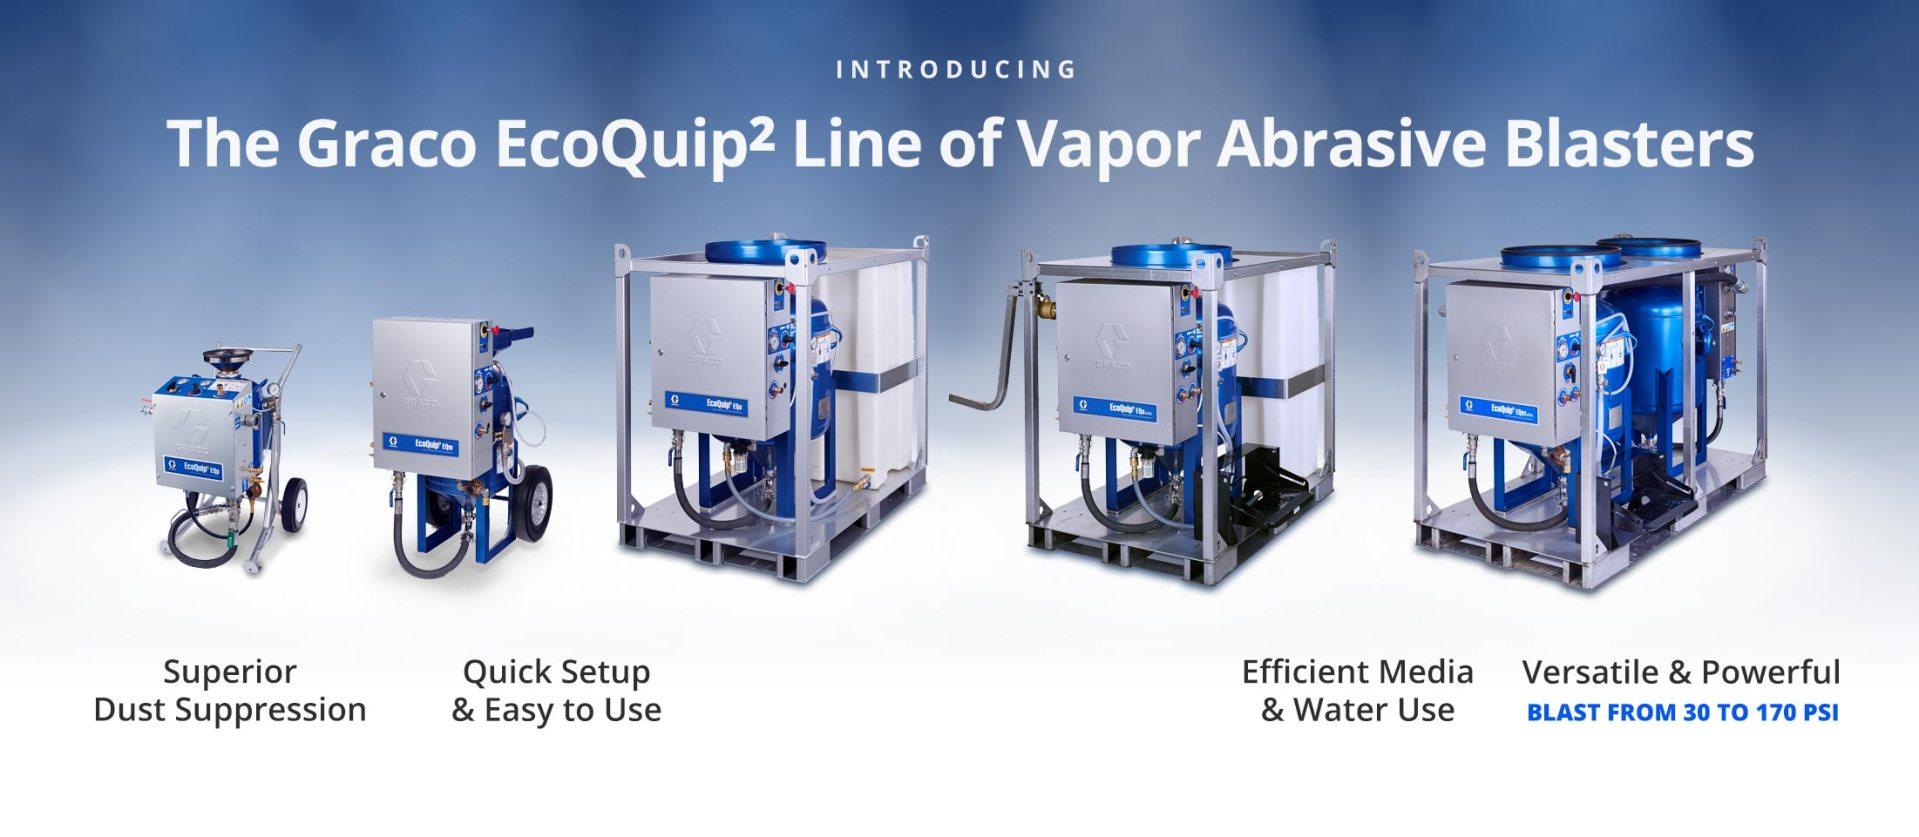 Blastall Equipment Amp Supply Graco Ecoquip Vapor Abrasive